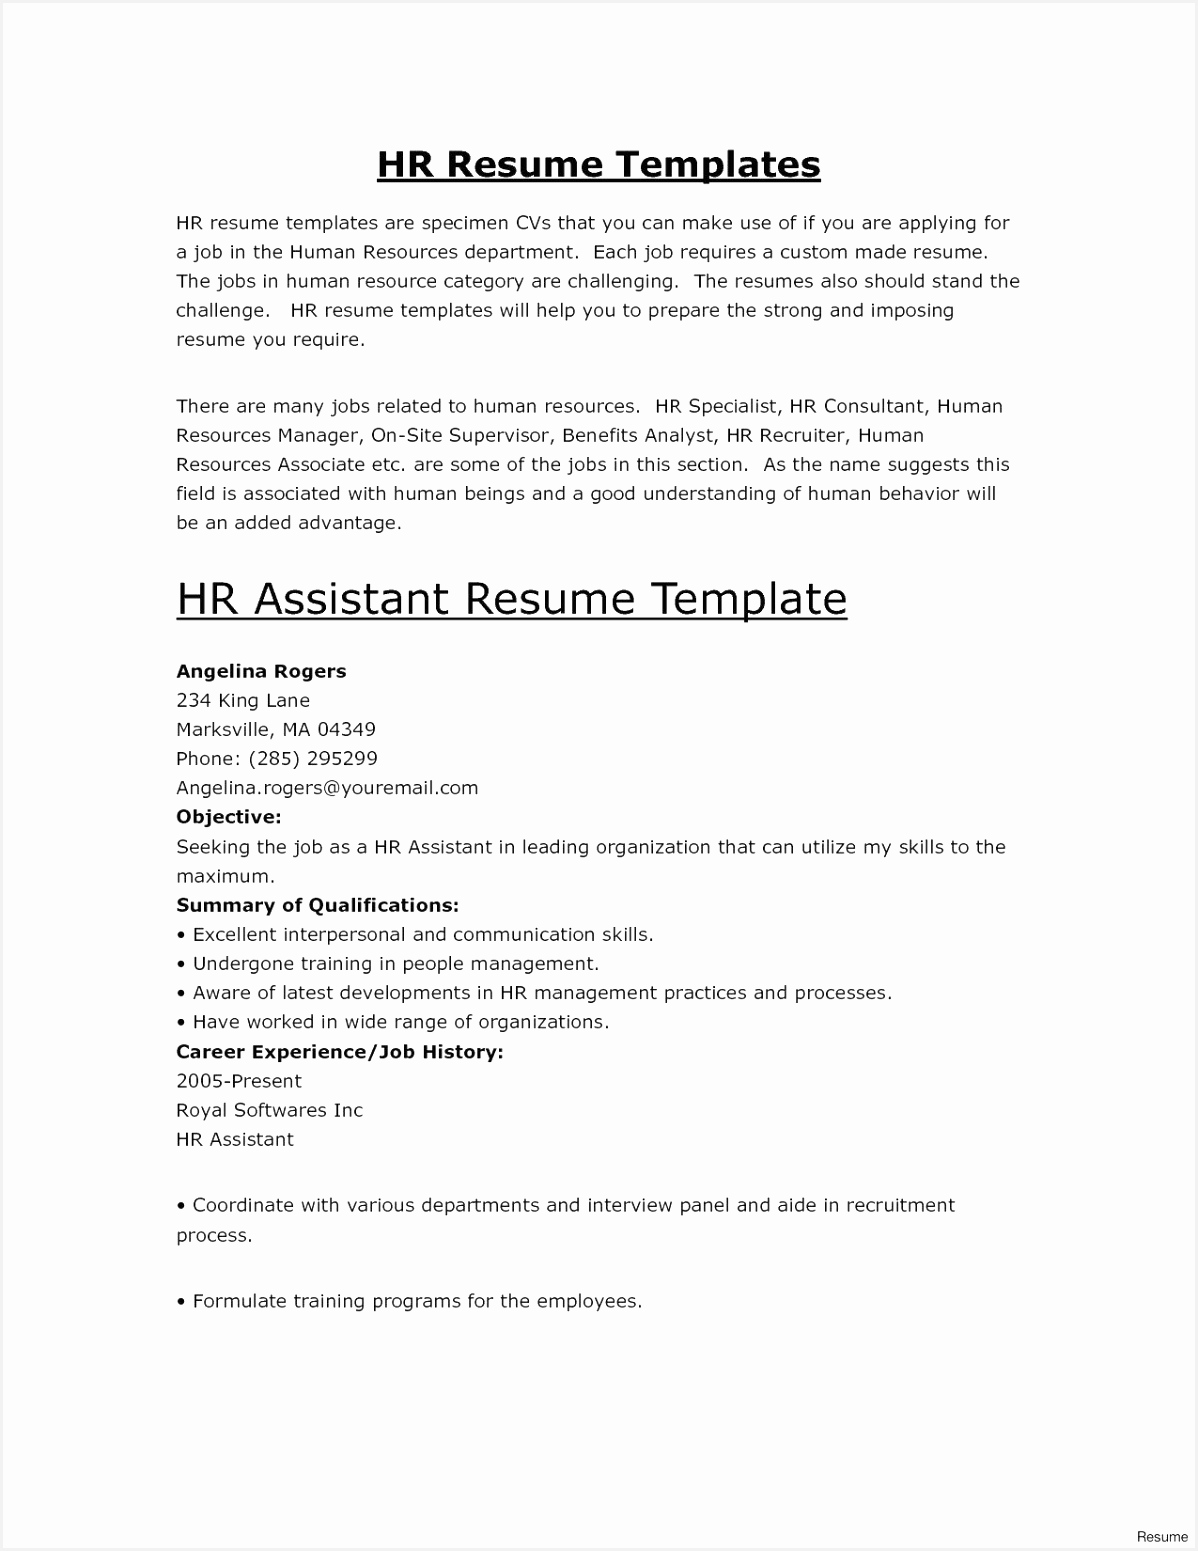 Keywords for Resumes Best Resume Keywords 0d Wallpapers 43 Lovely 15511198fikdX